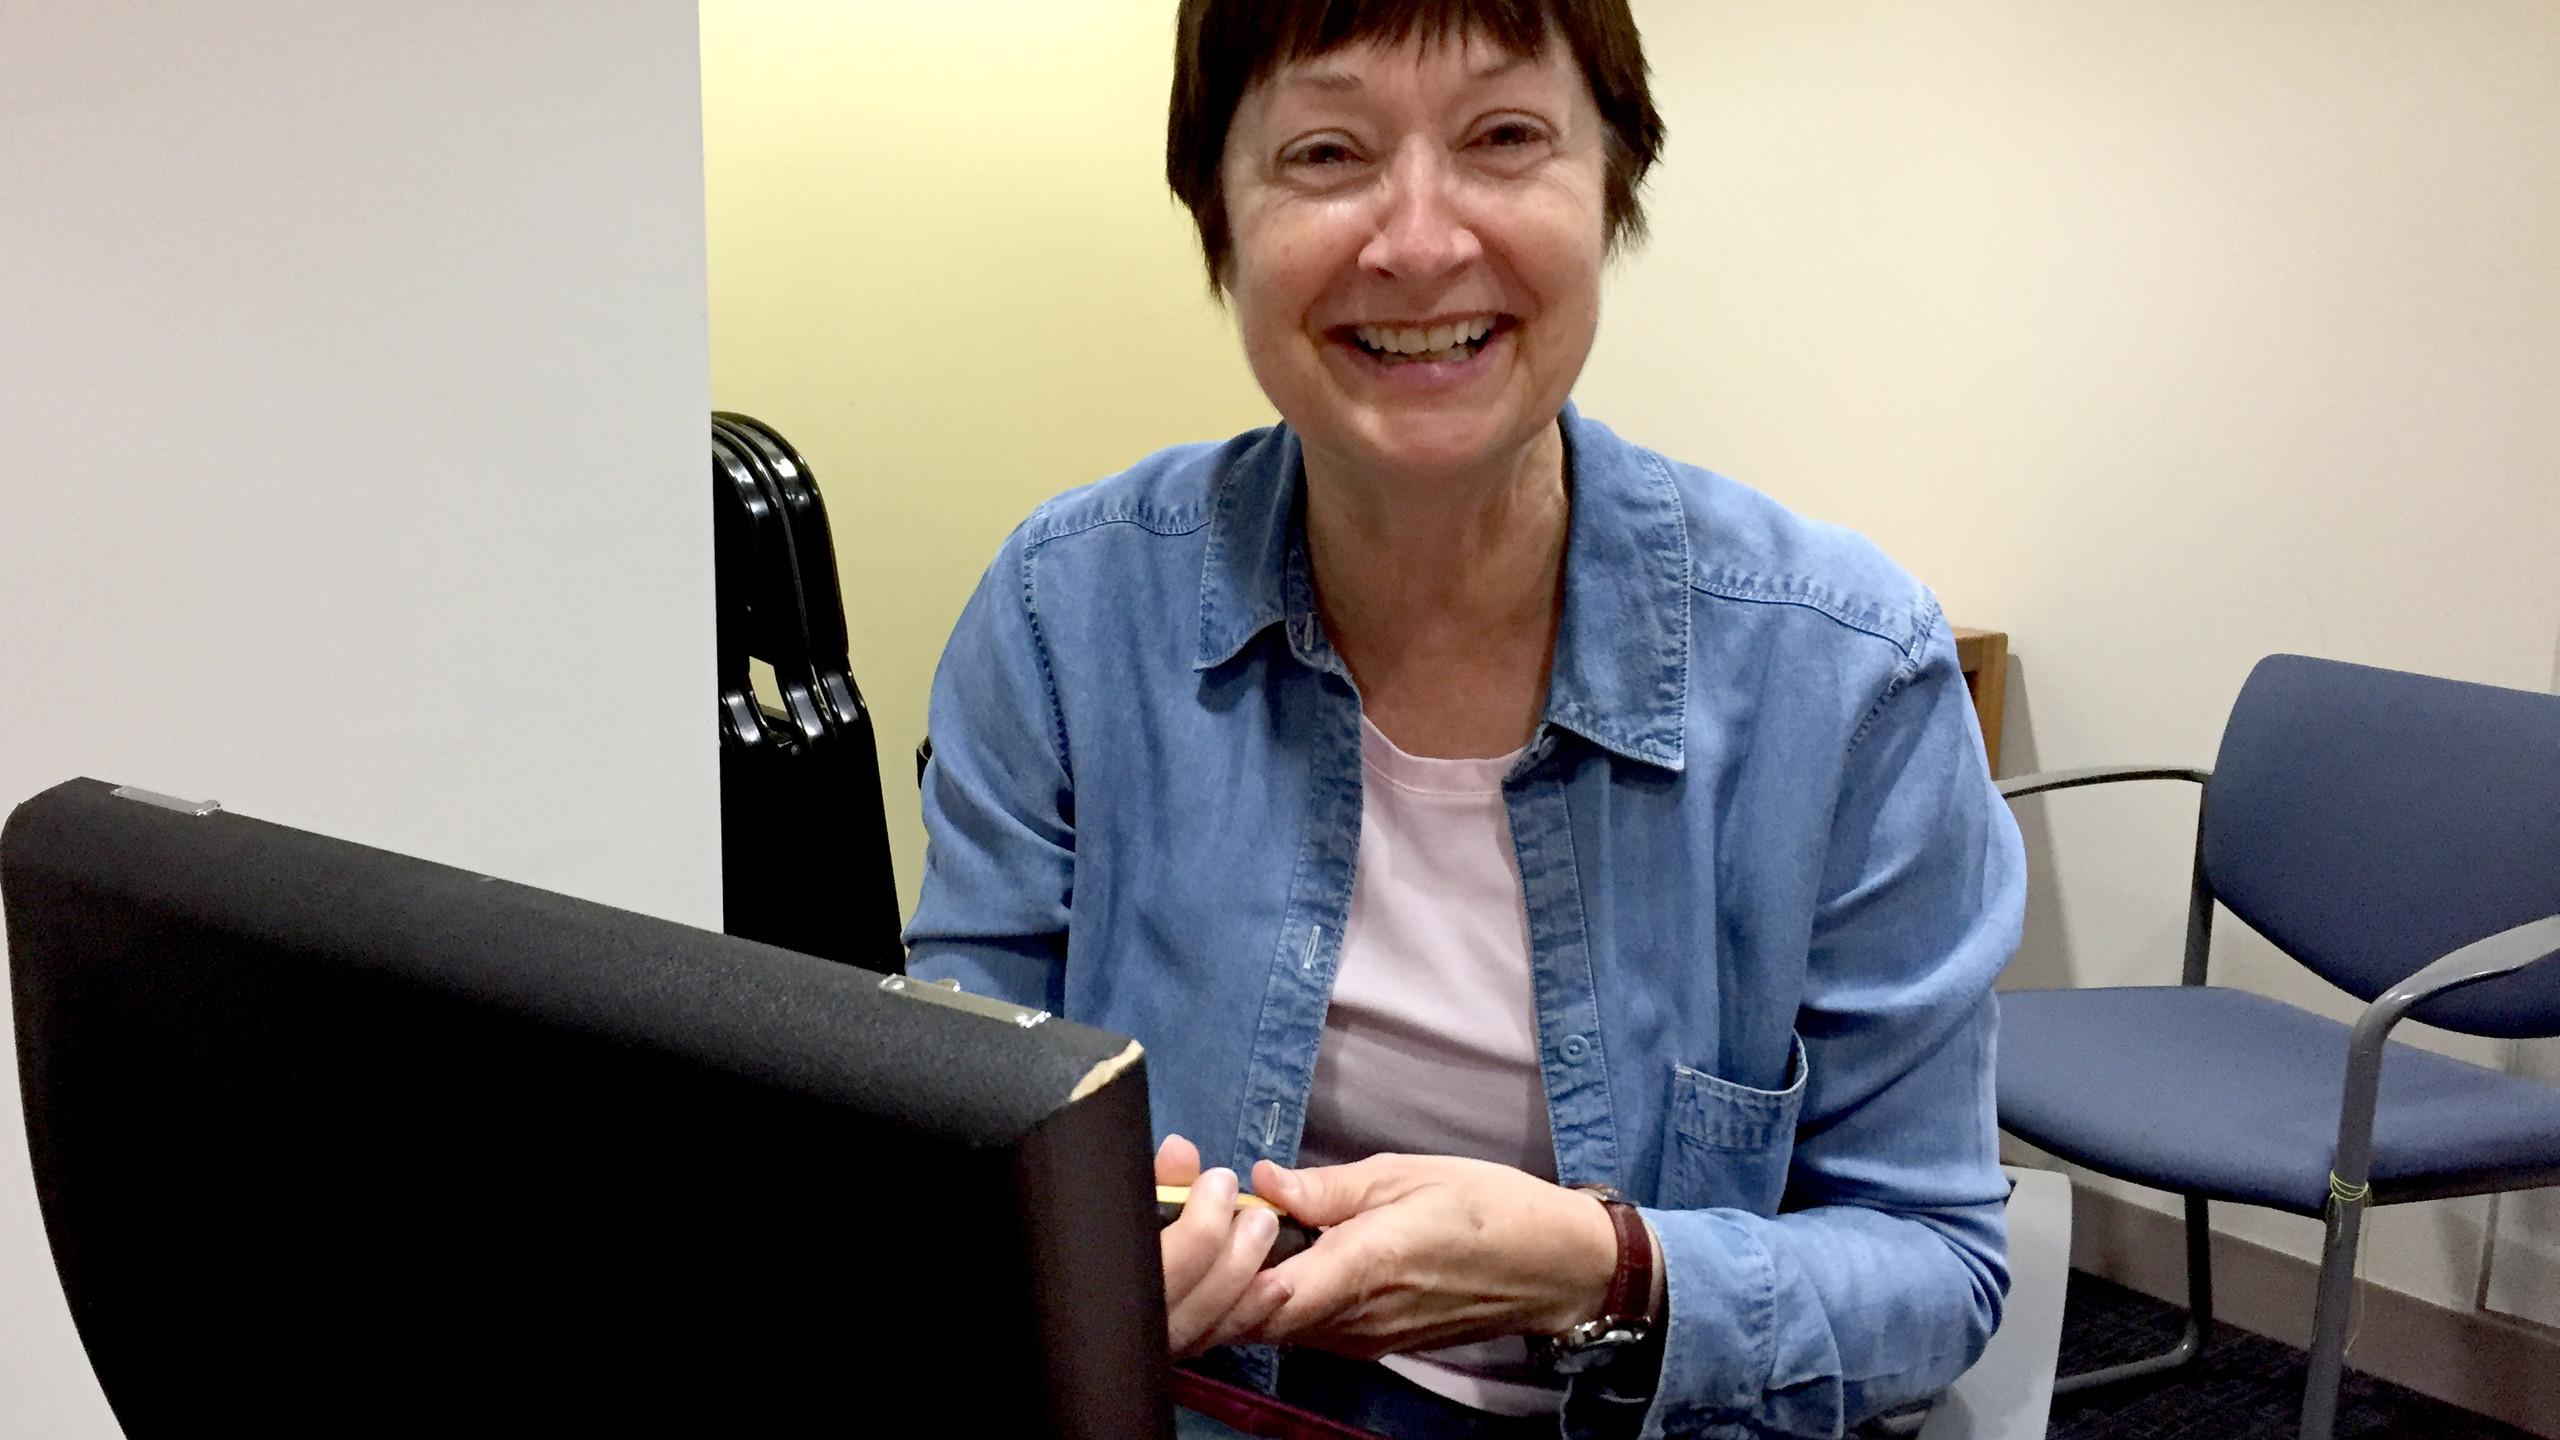 Cathy Hudgins